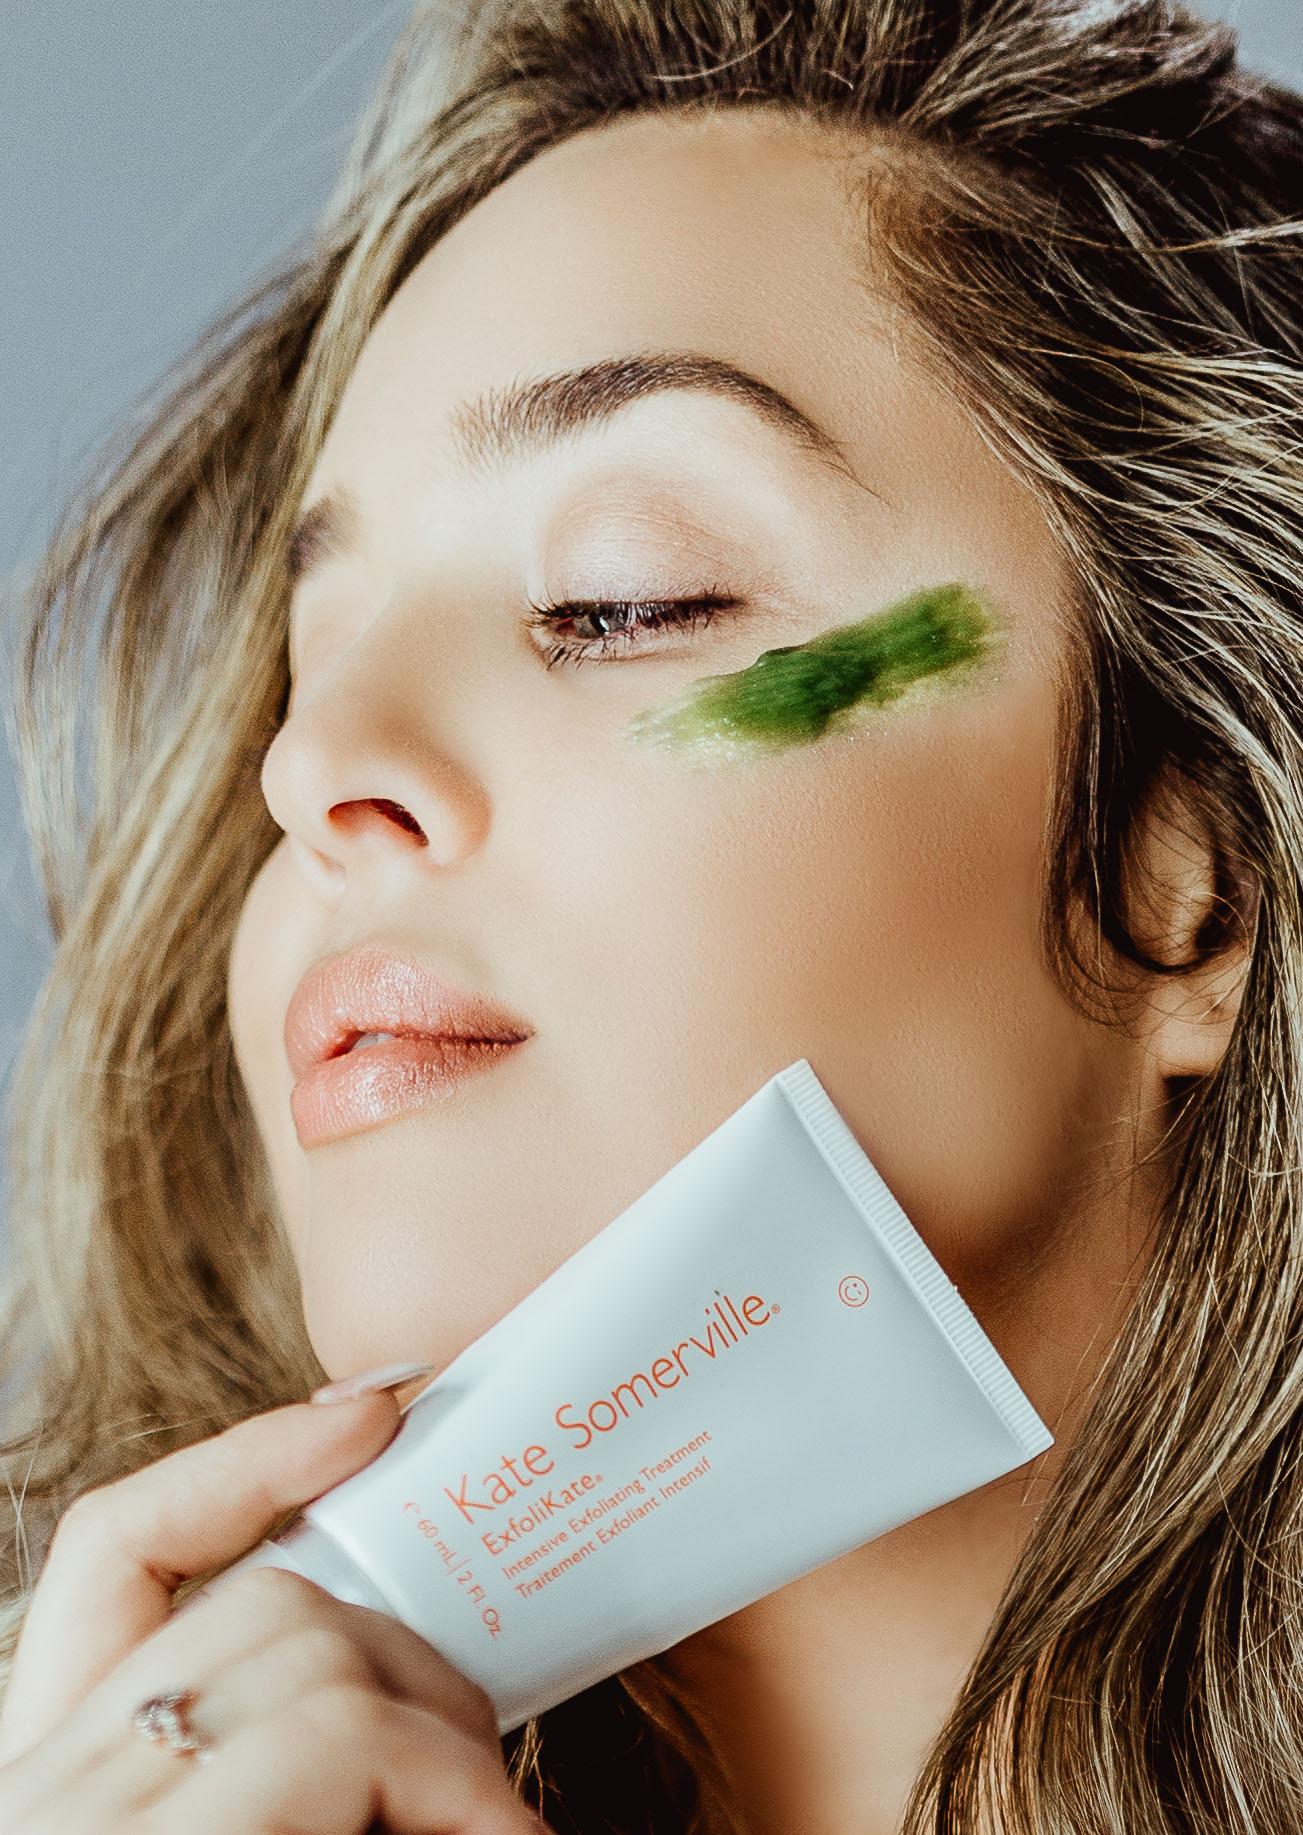 Briana Dai for Kate Somerville Skincare